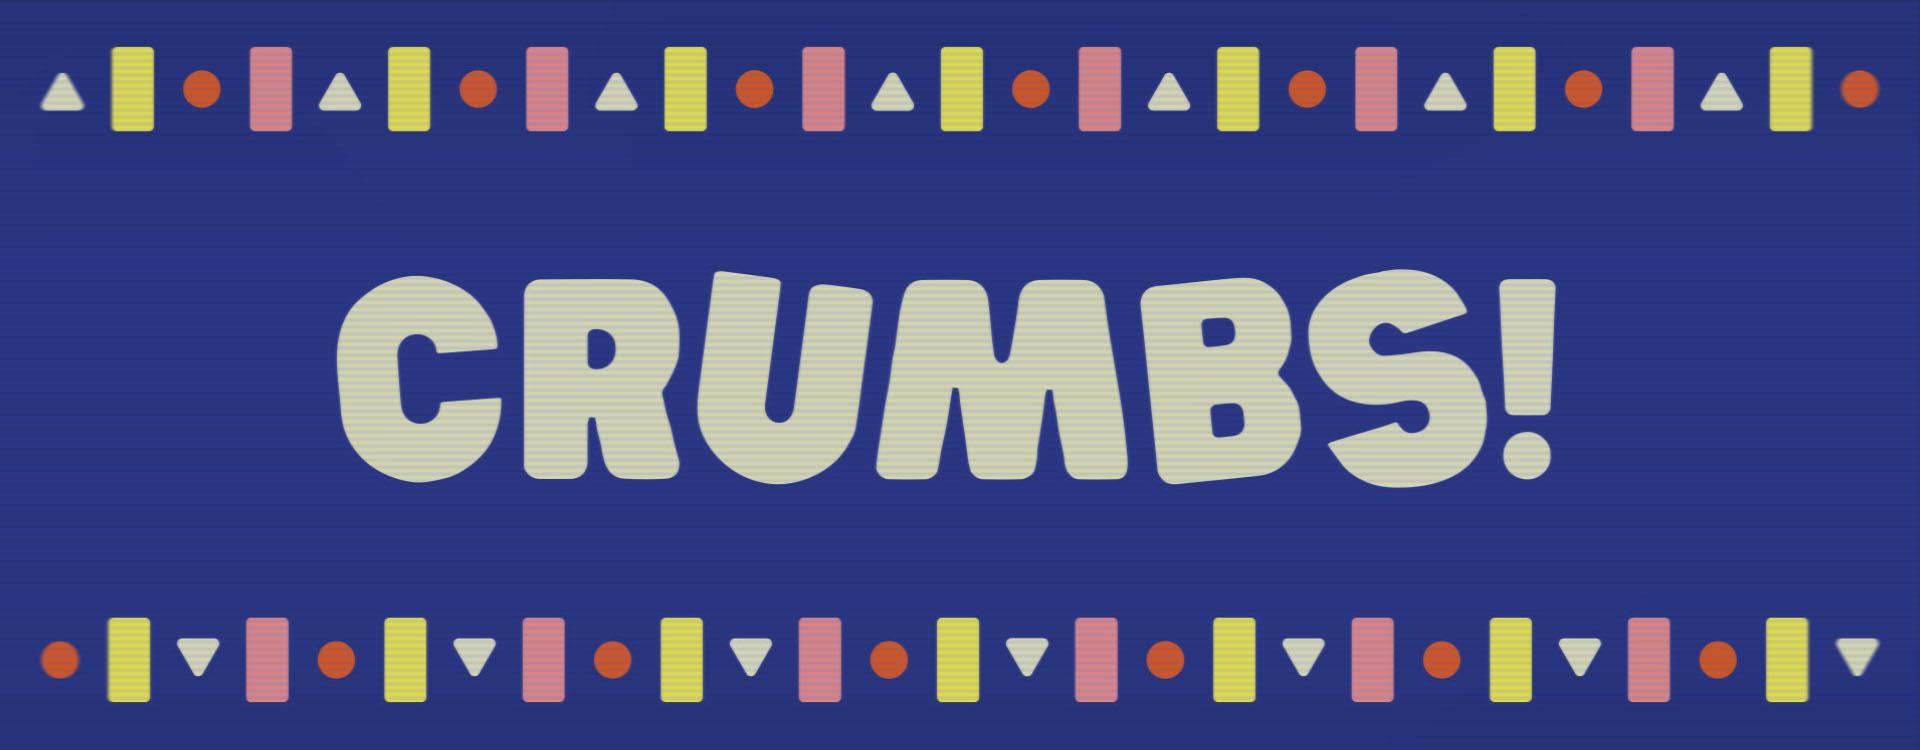 crumbs_title.jpg